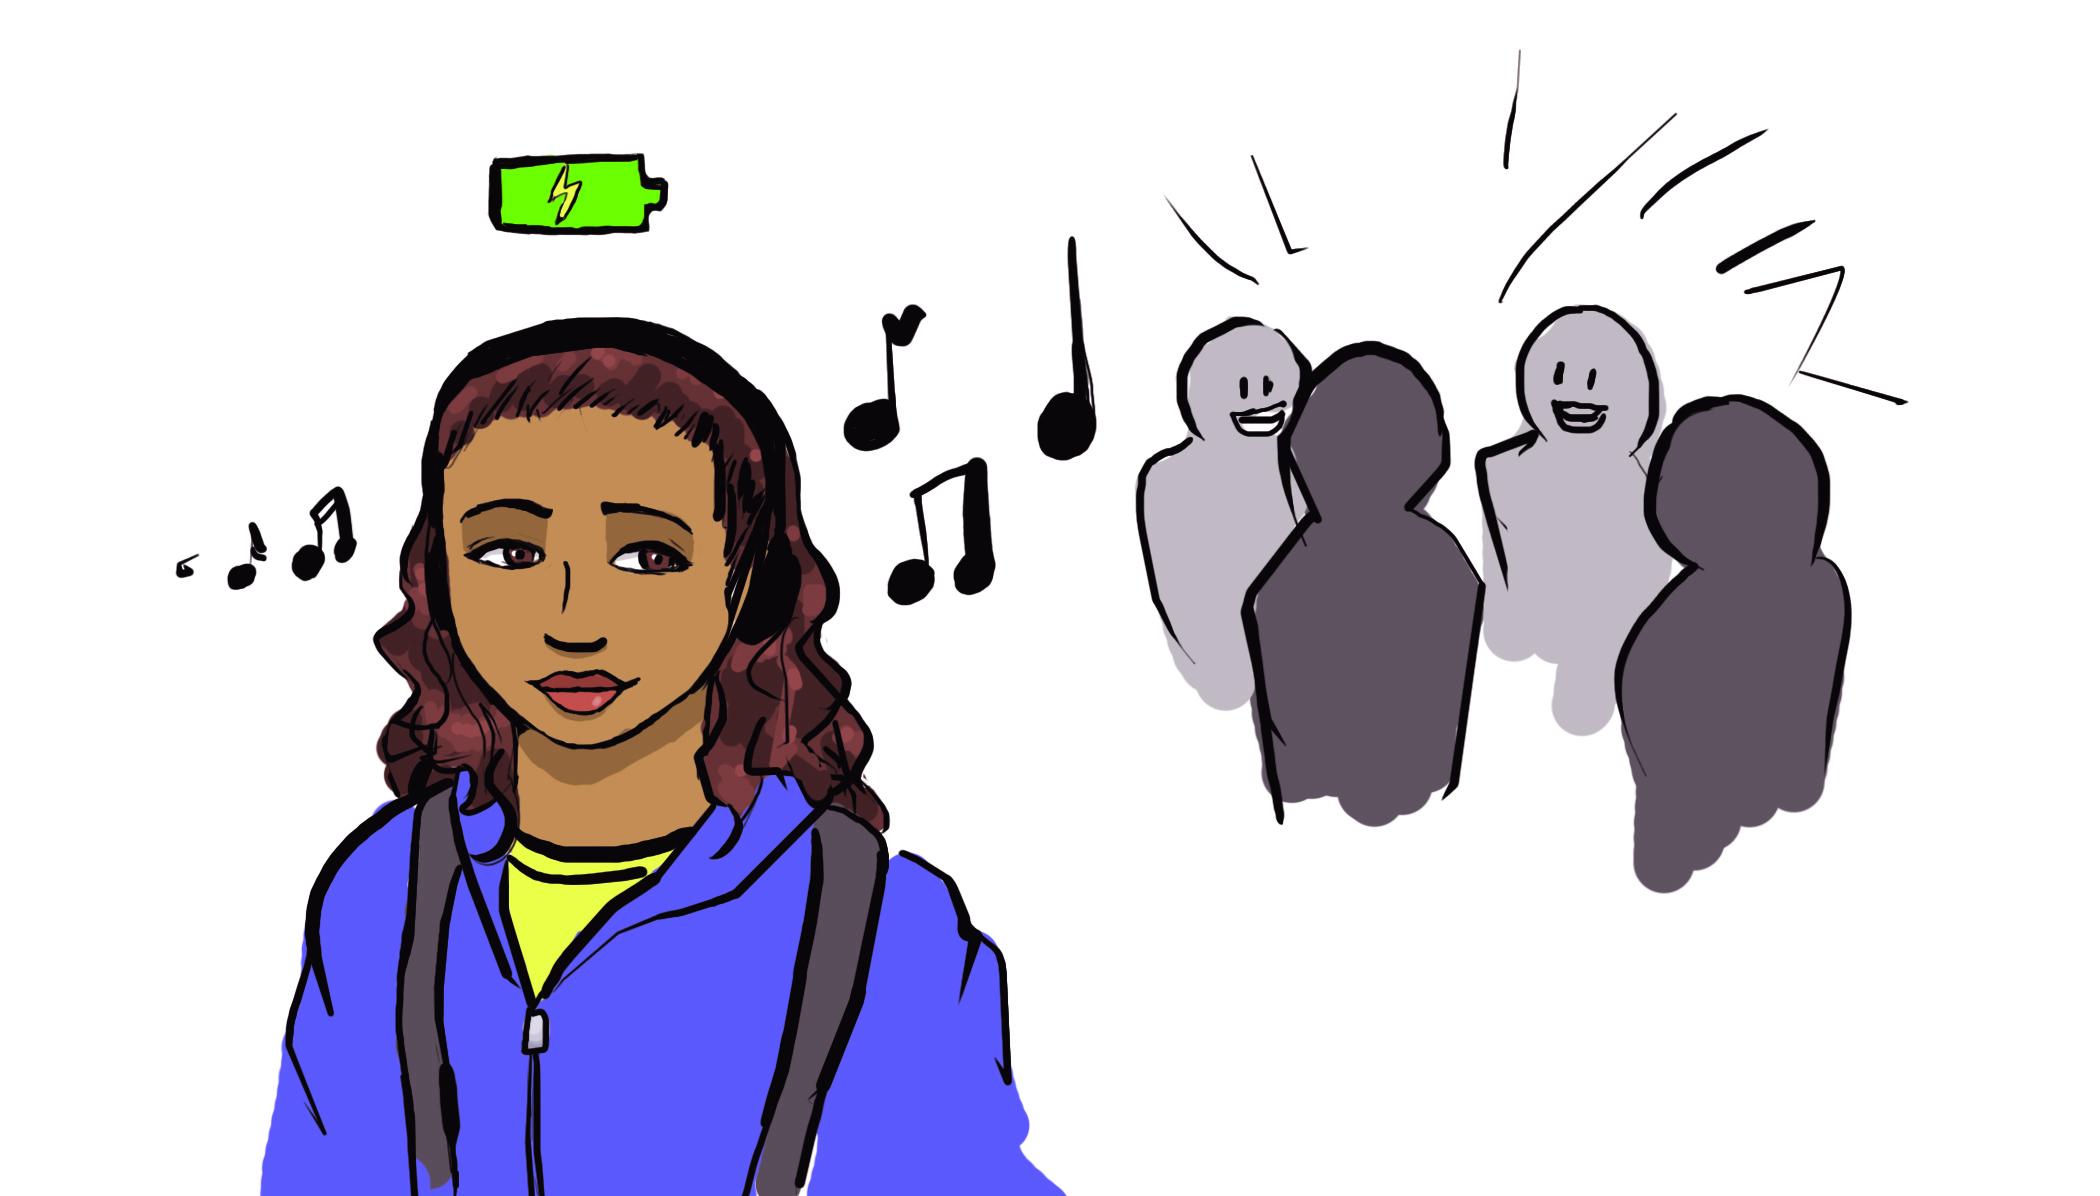 Image result for misunderstood person cartoon